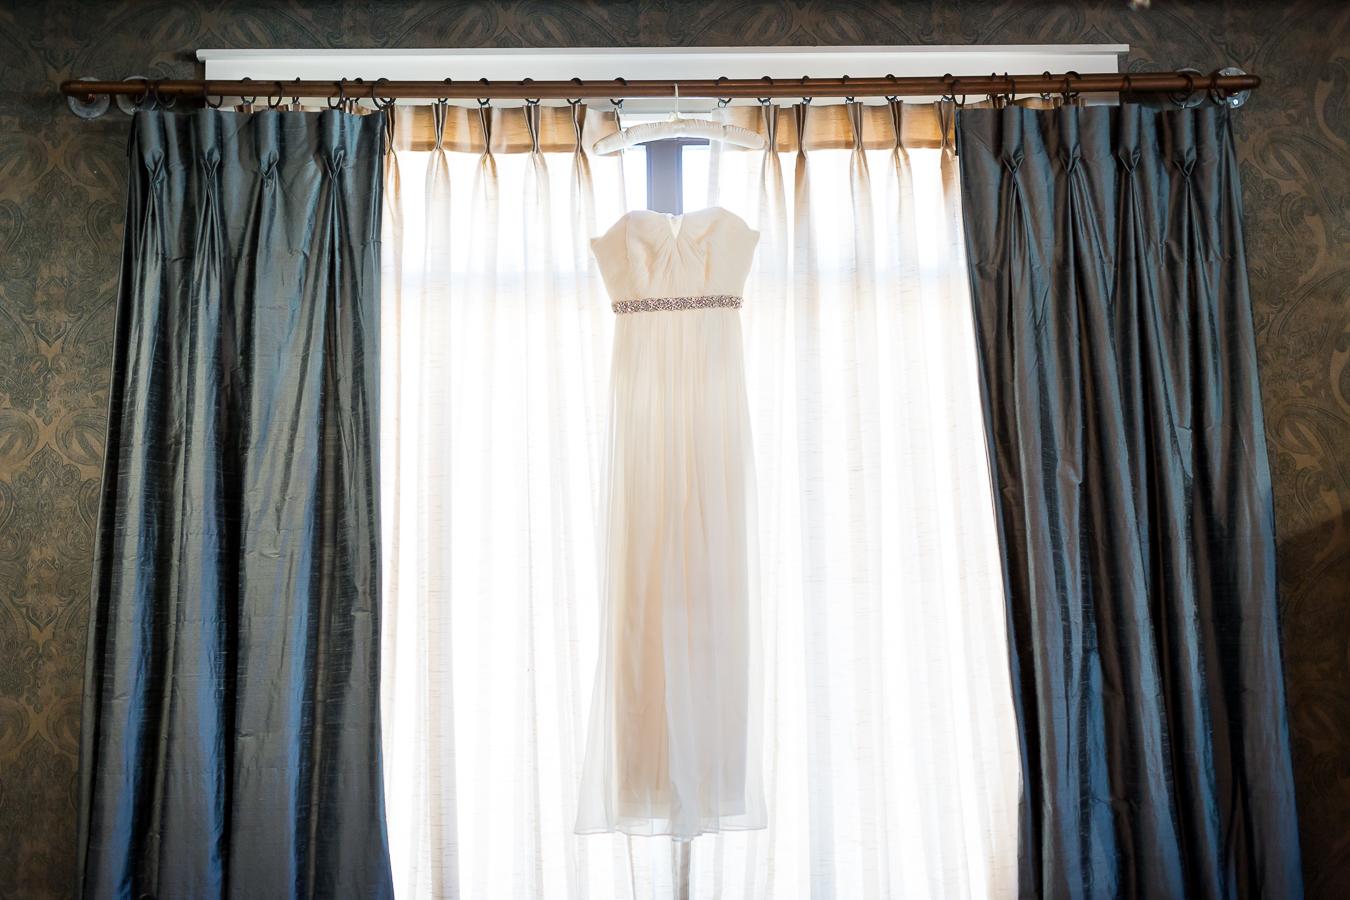 union-on-eighth-wedding-photographs-003.jpg